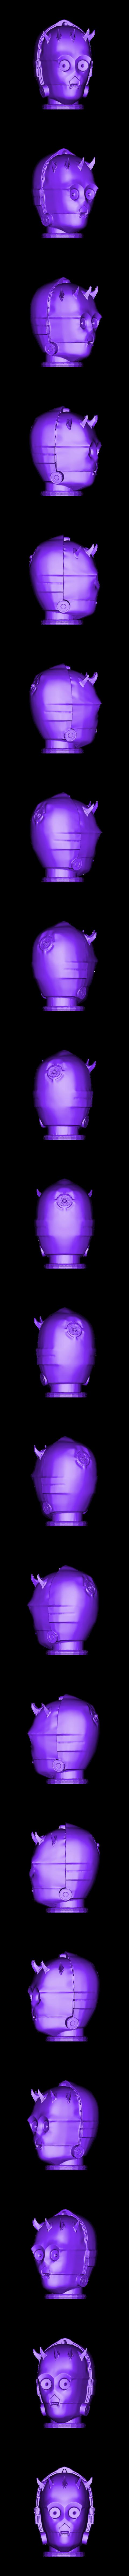 Darth_C_3PO.OBJ Download free OBJ file Darth C-3PO • 3D printable template, Snorri